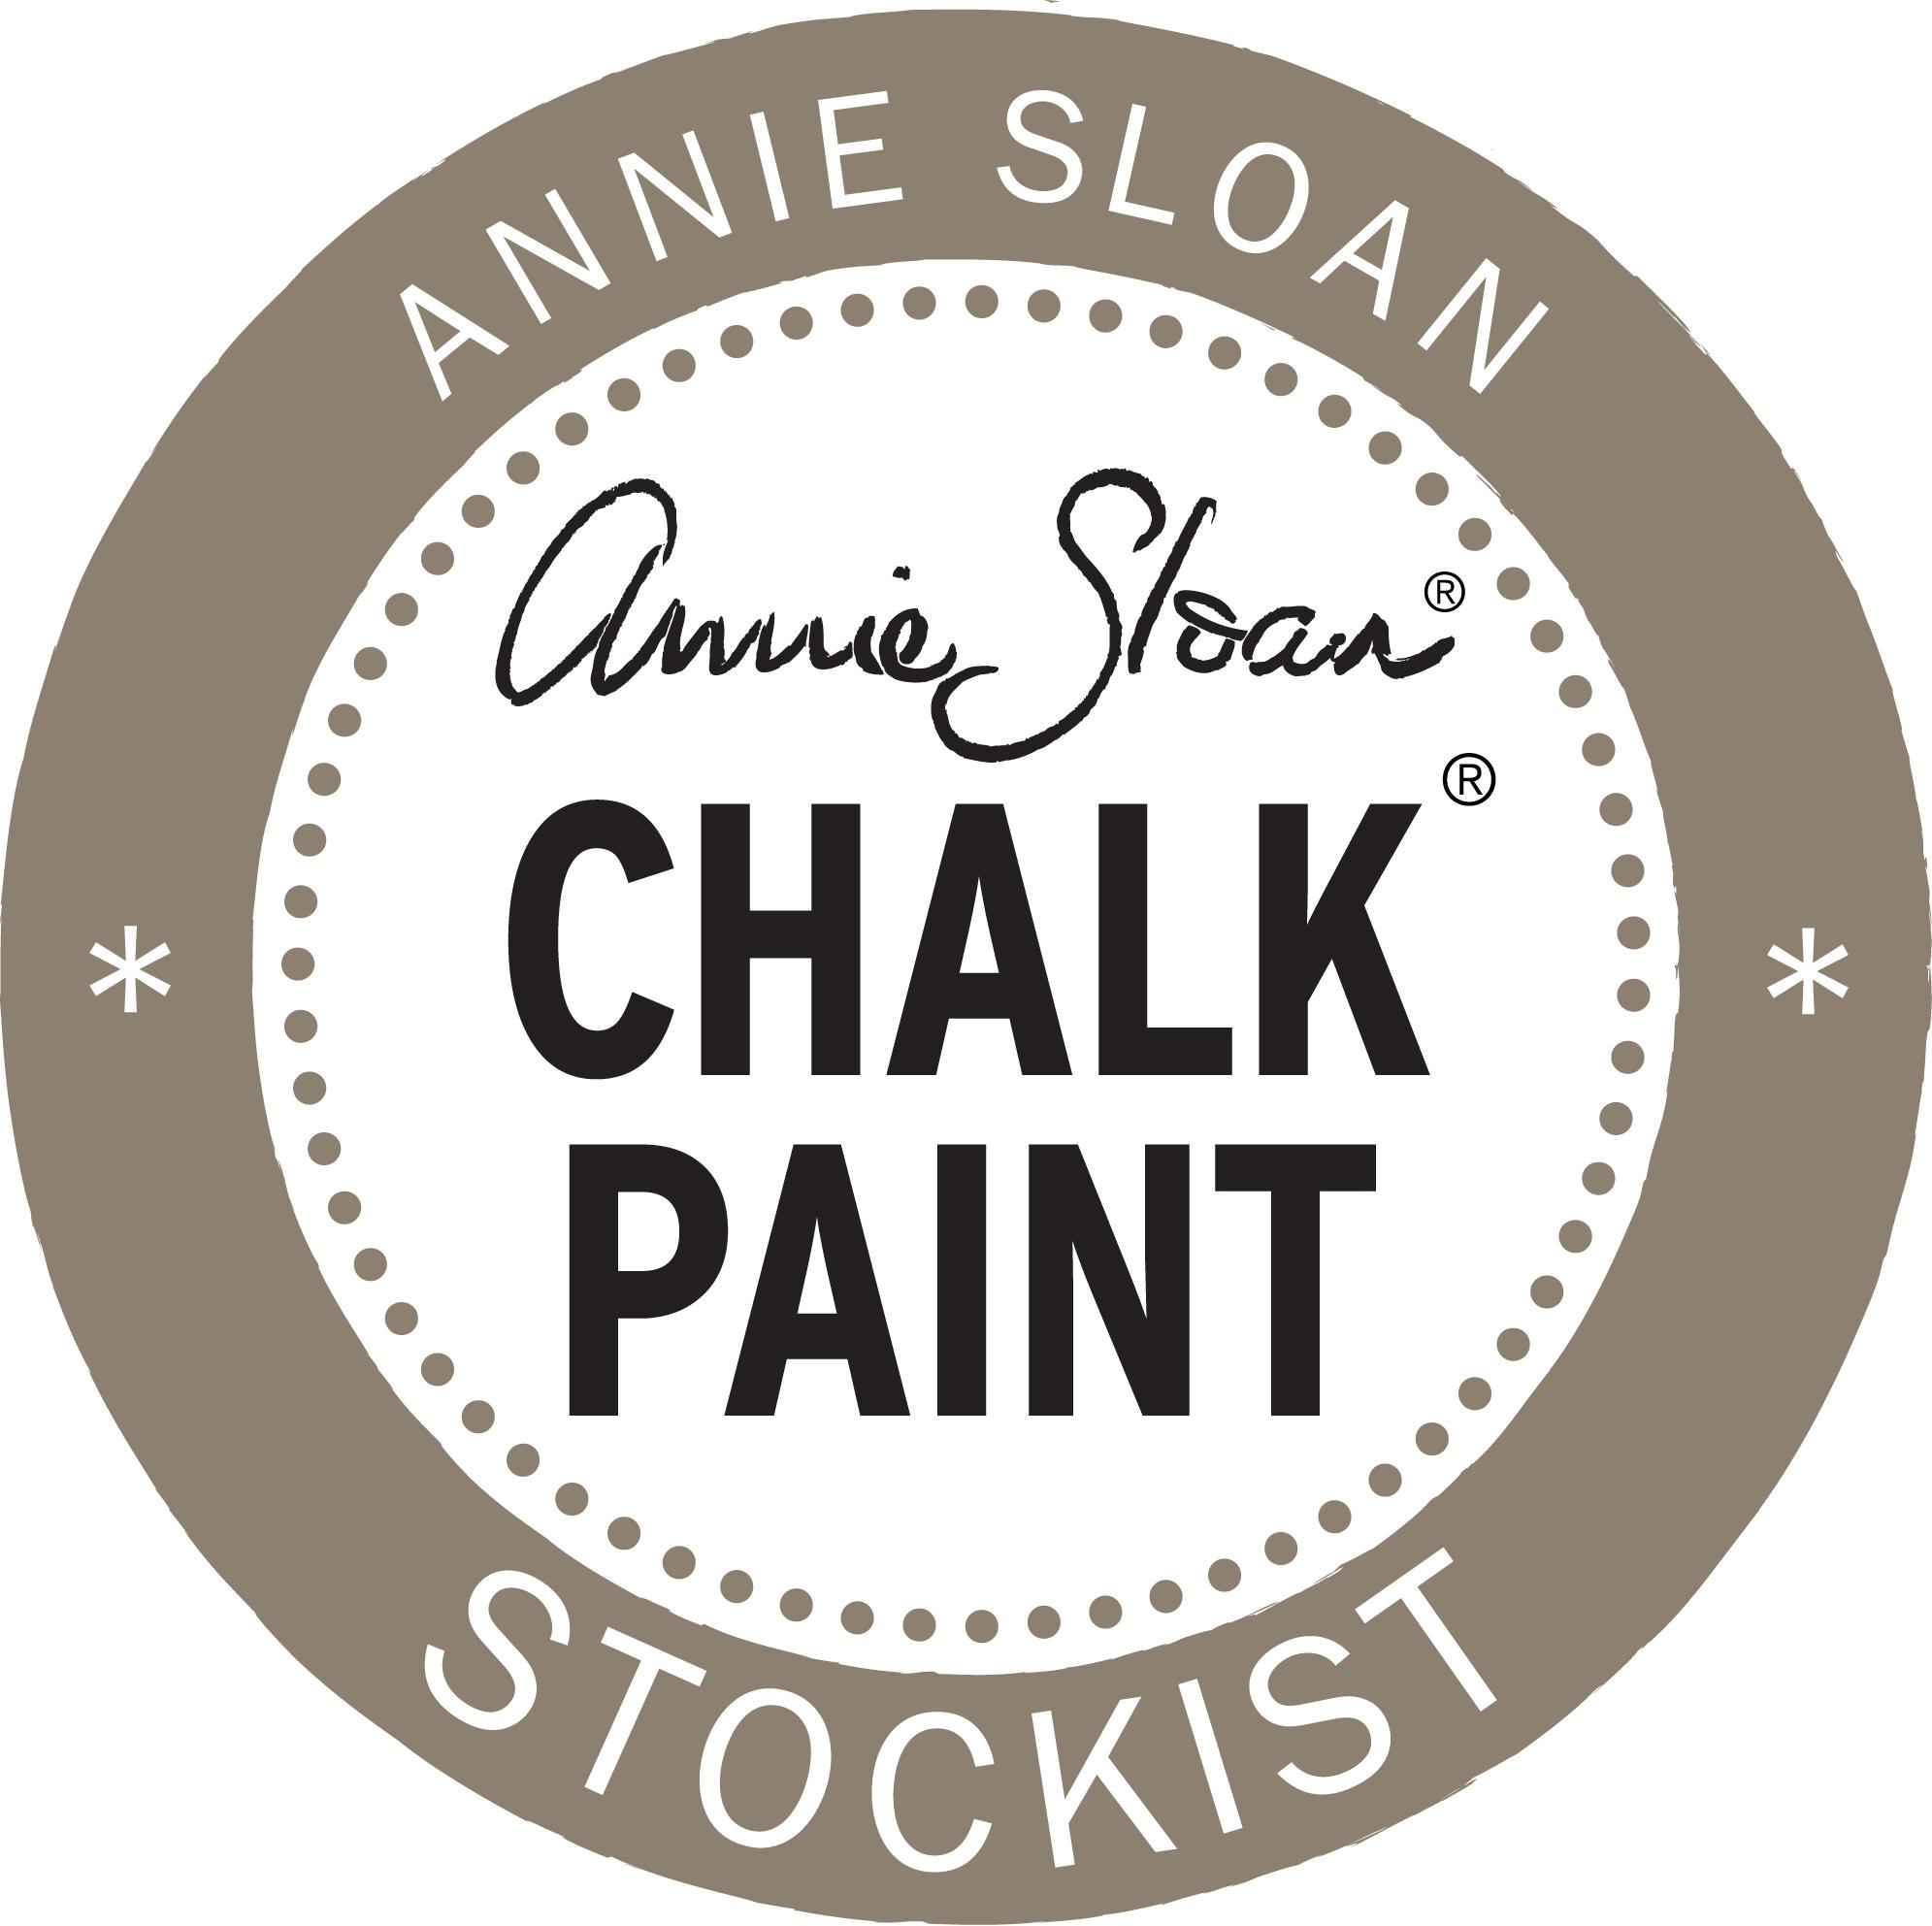 Annie Sloan - Stockist logos - Chalk Paint - French Grey.jpg